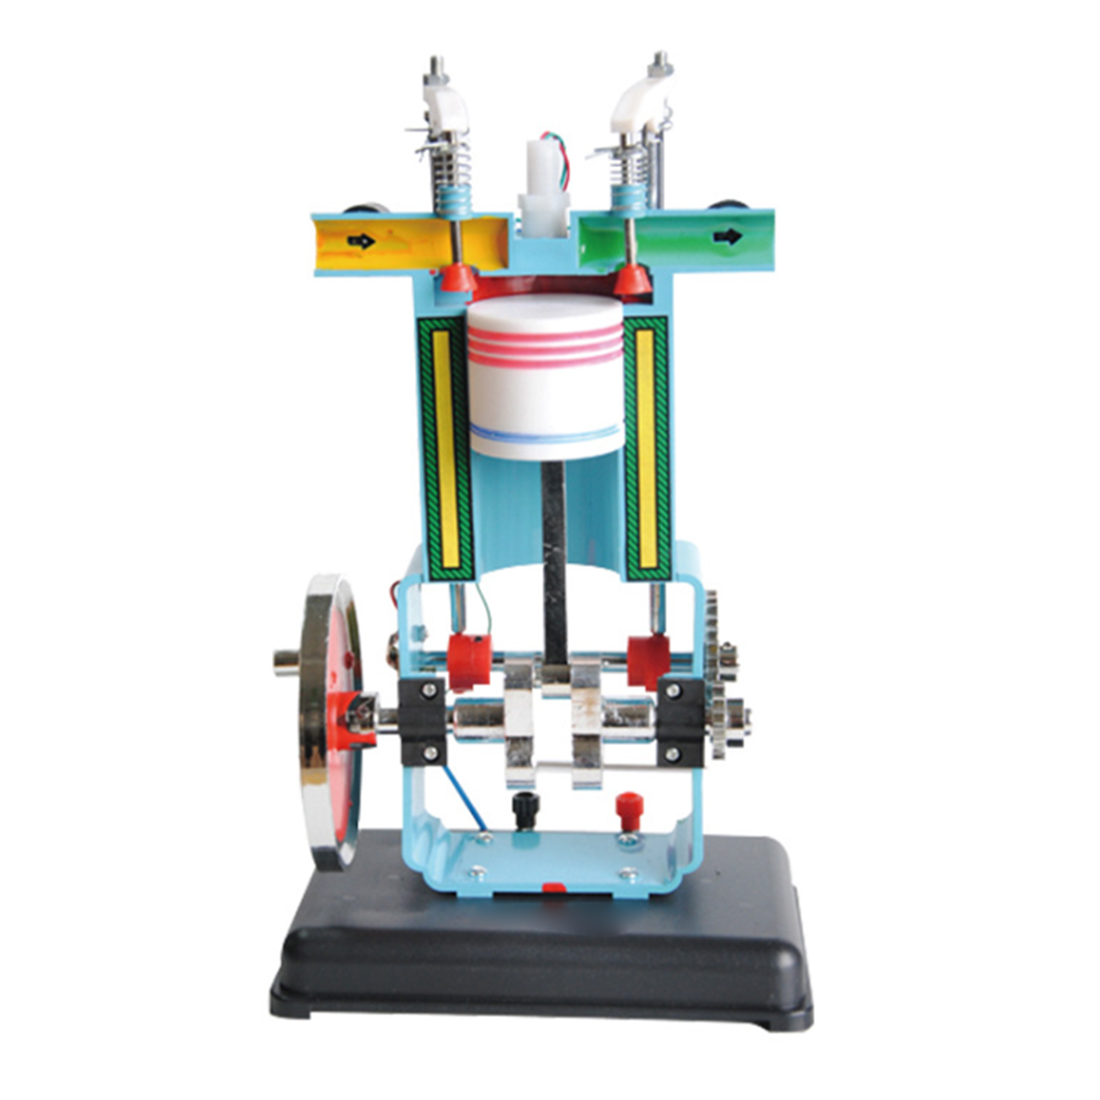 Gasoline Engine Model Four-Stroke Single Cylinder Physical Experimental Equipment